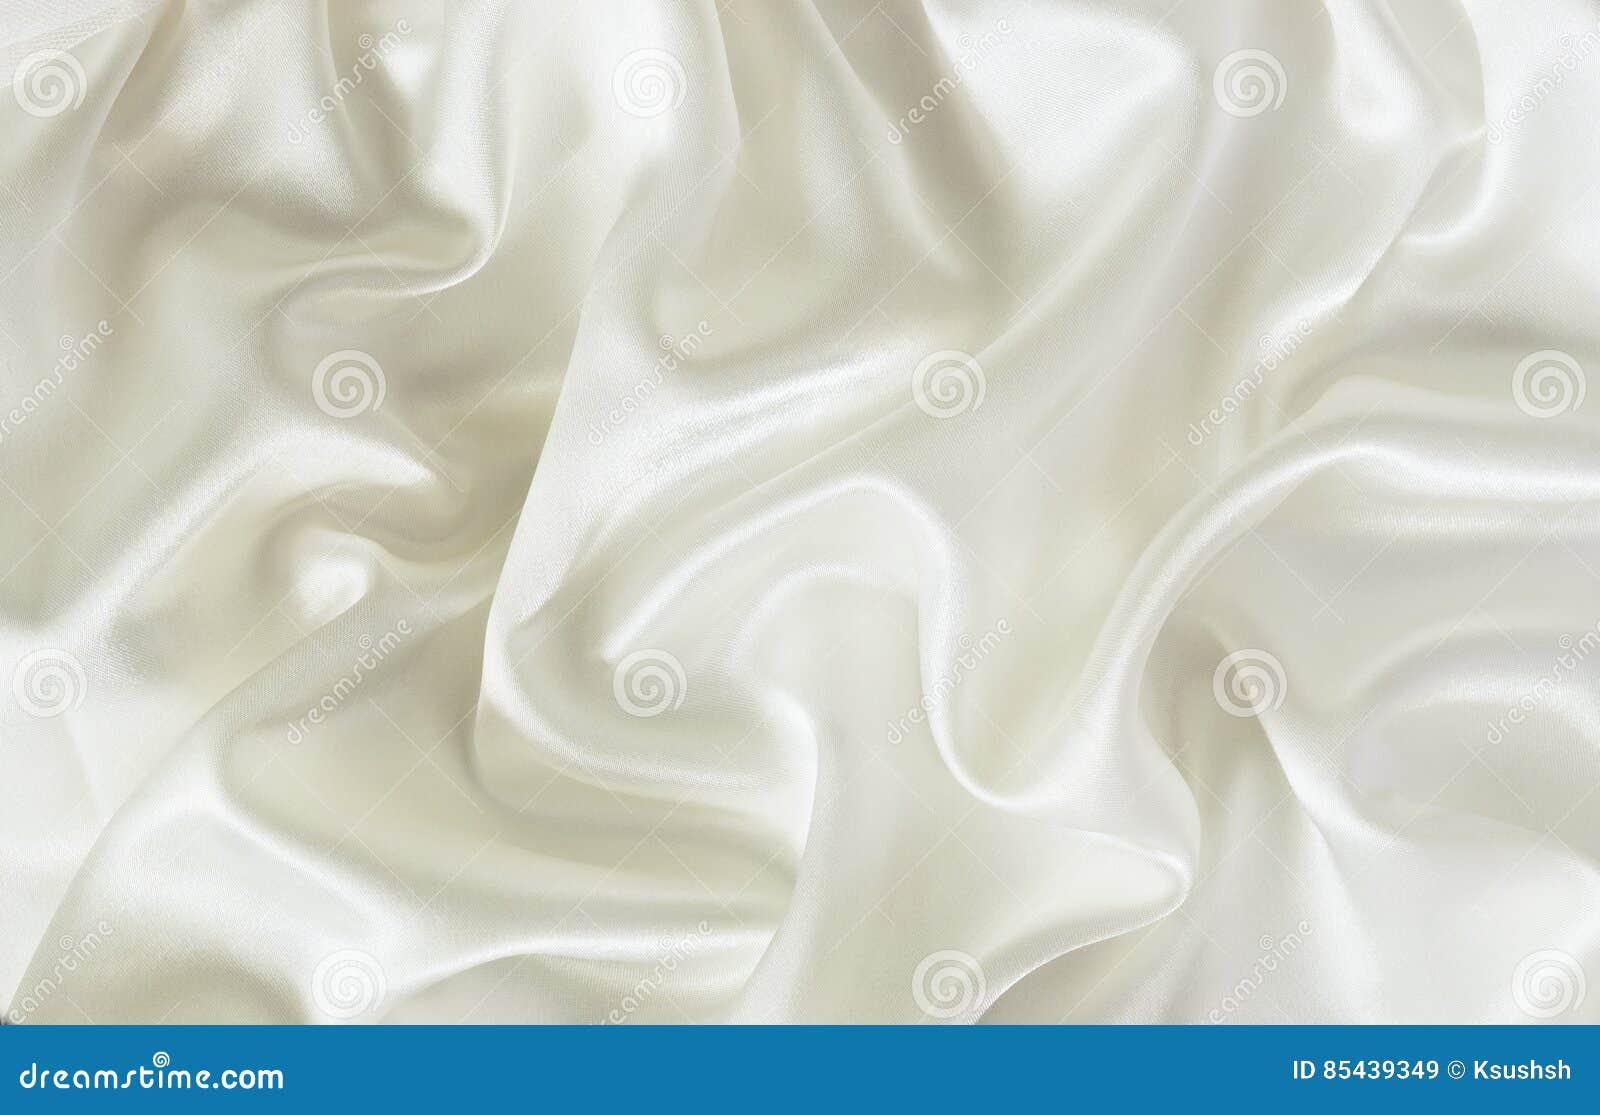 Closeup of white silk fabric